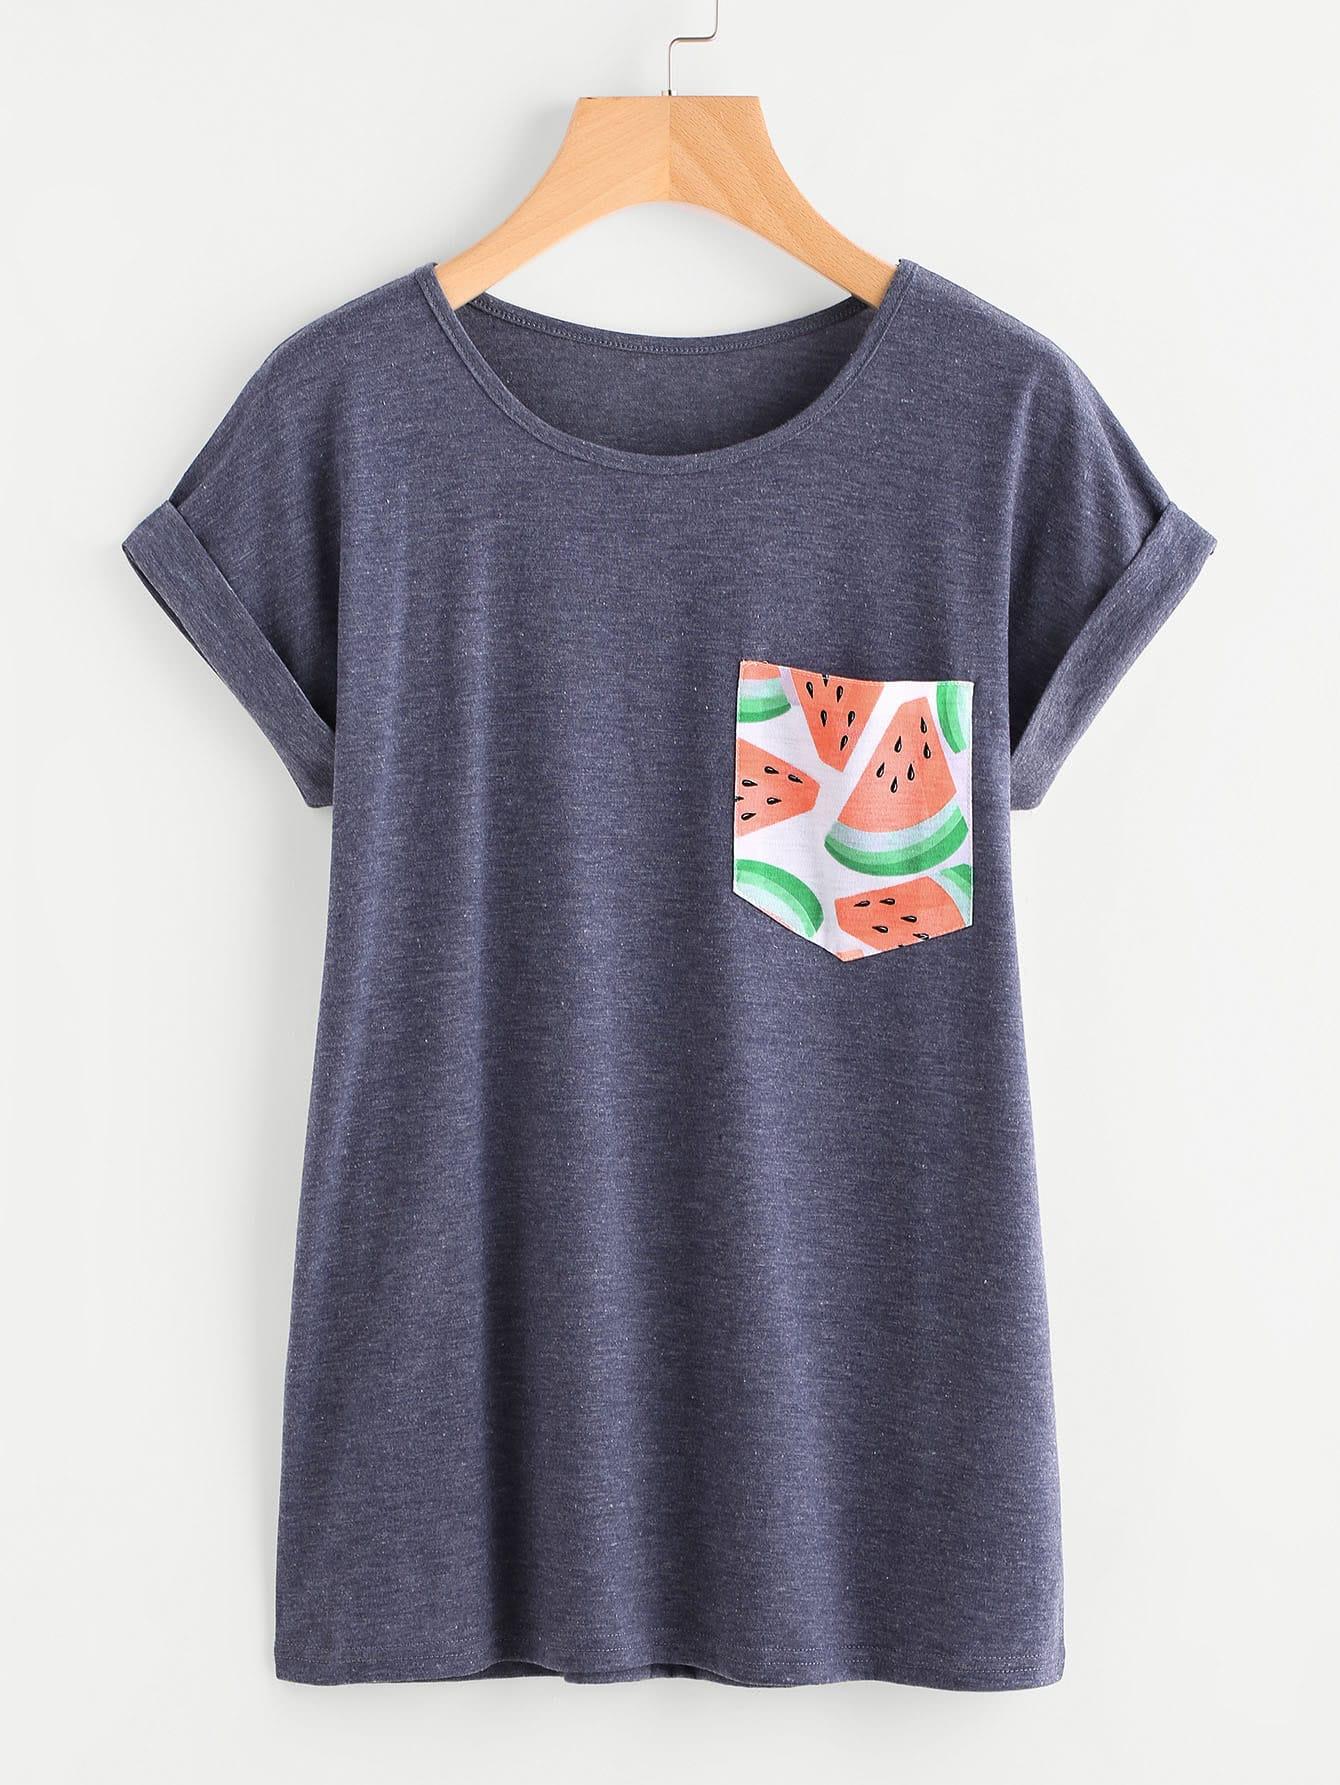 Contrast Watermelon Print Pocket Cuffed Tee